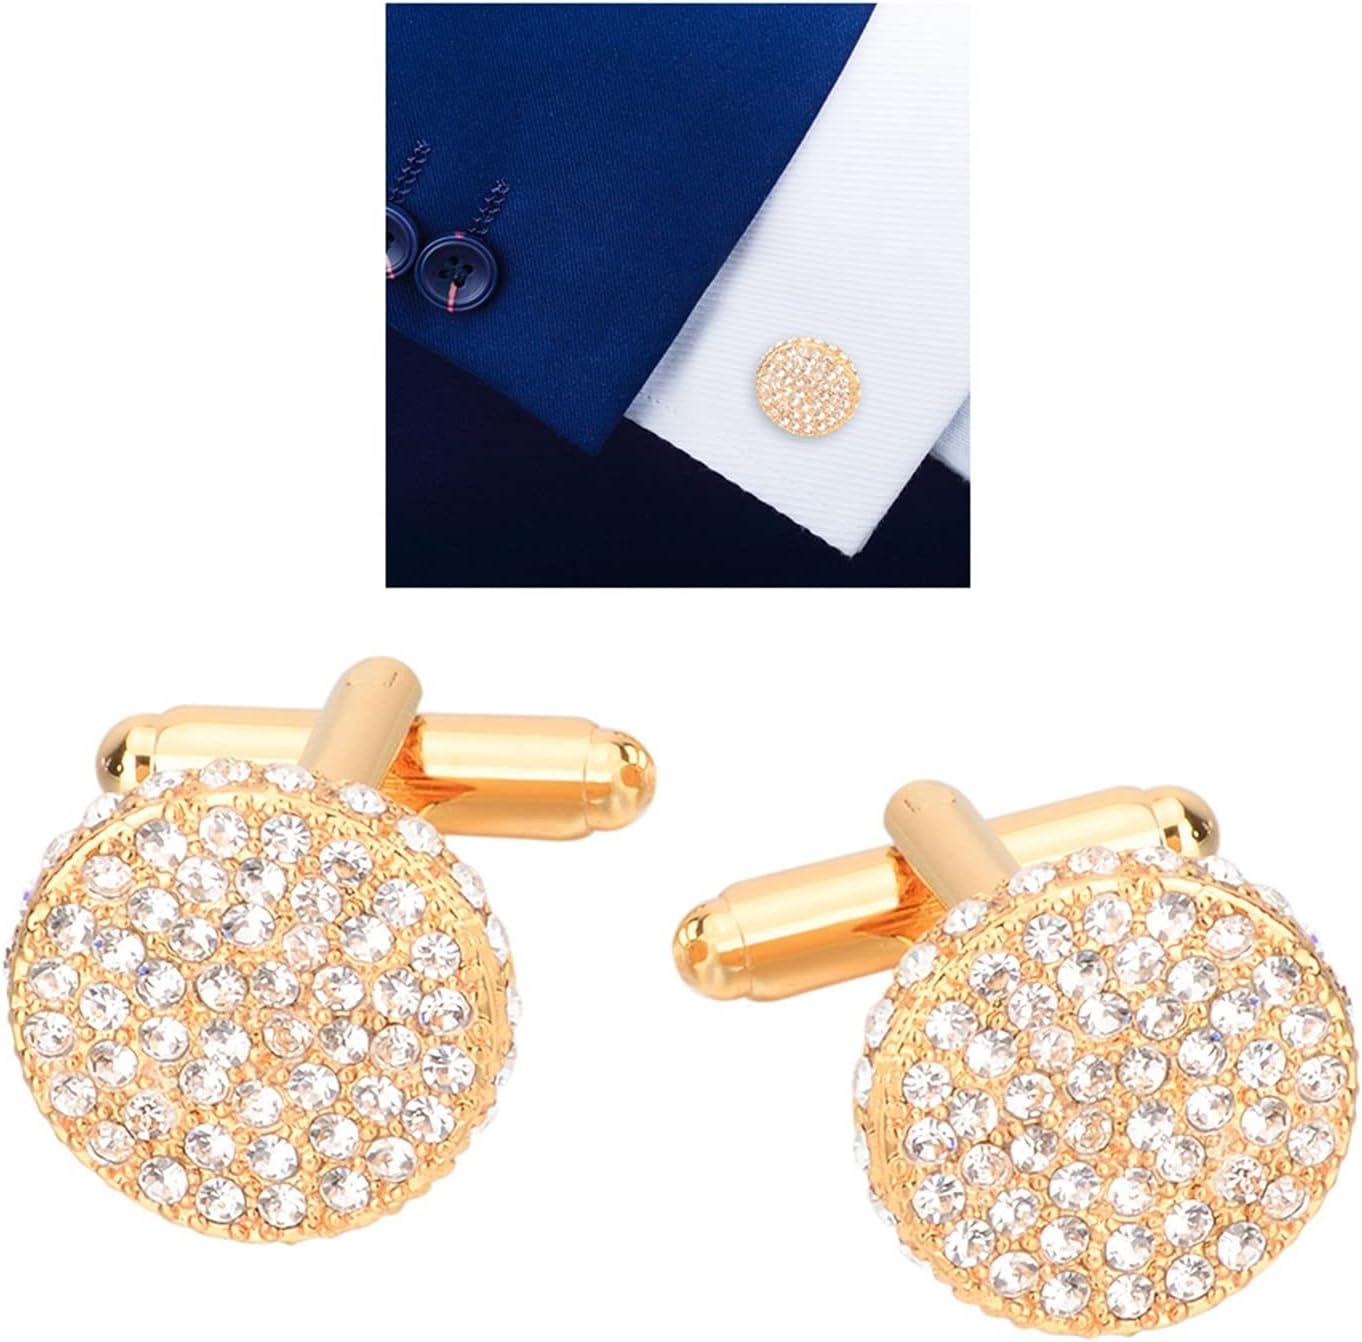 chenfeng Cufflinks 1 Pair Wedding Crystal Rhinestone Cuff Links Shirt Suit Collar Cufflinks Gold